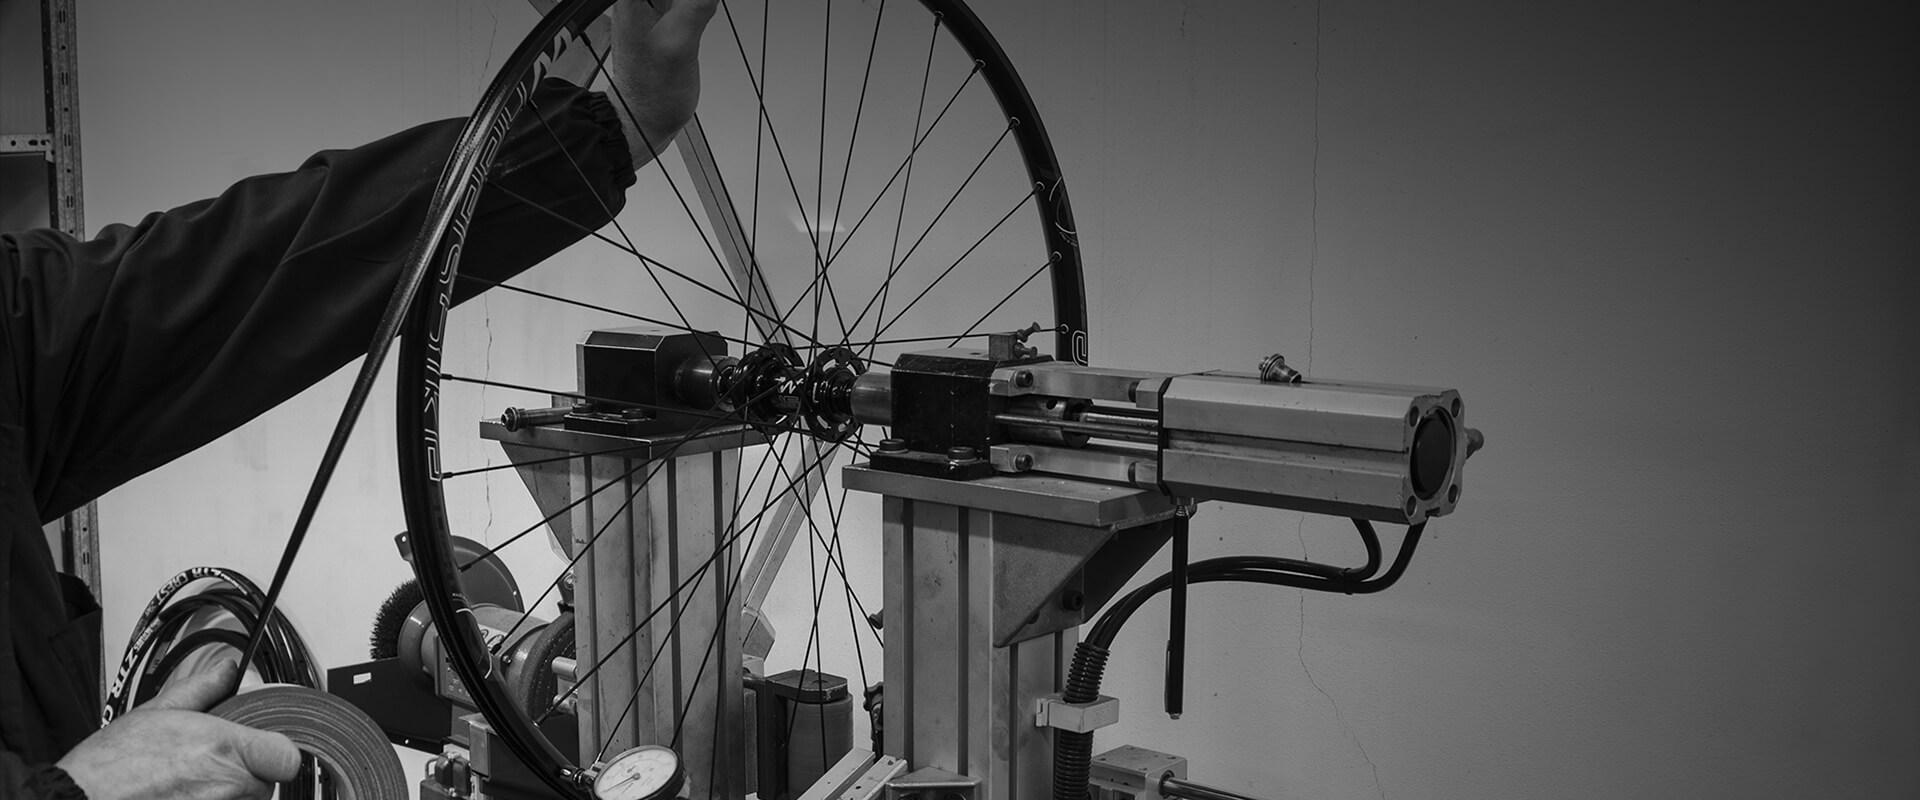 centro assistenza ruote handbike wheelsbike